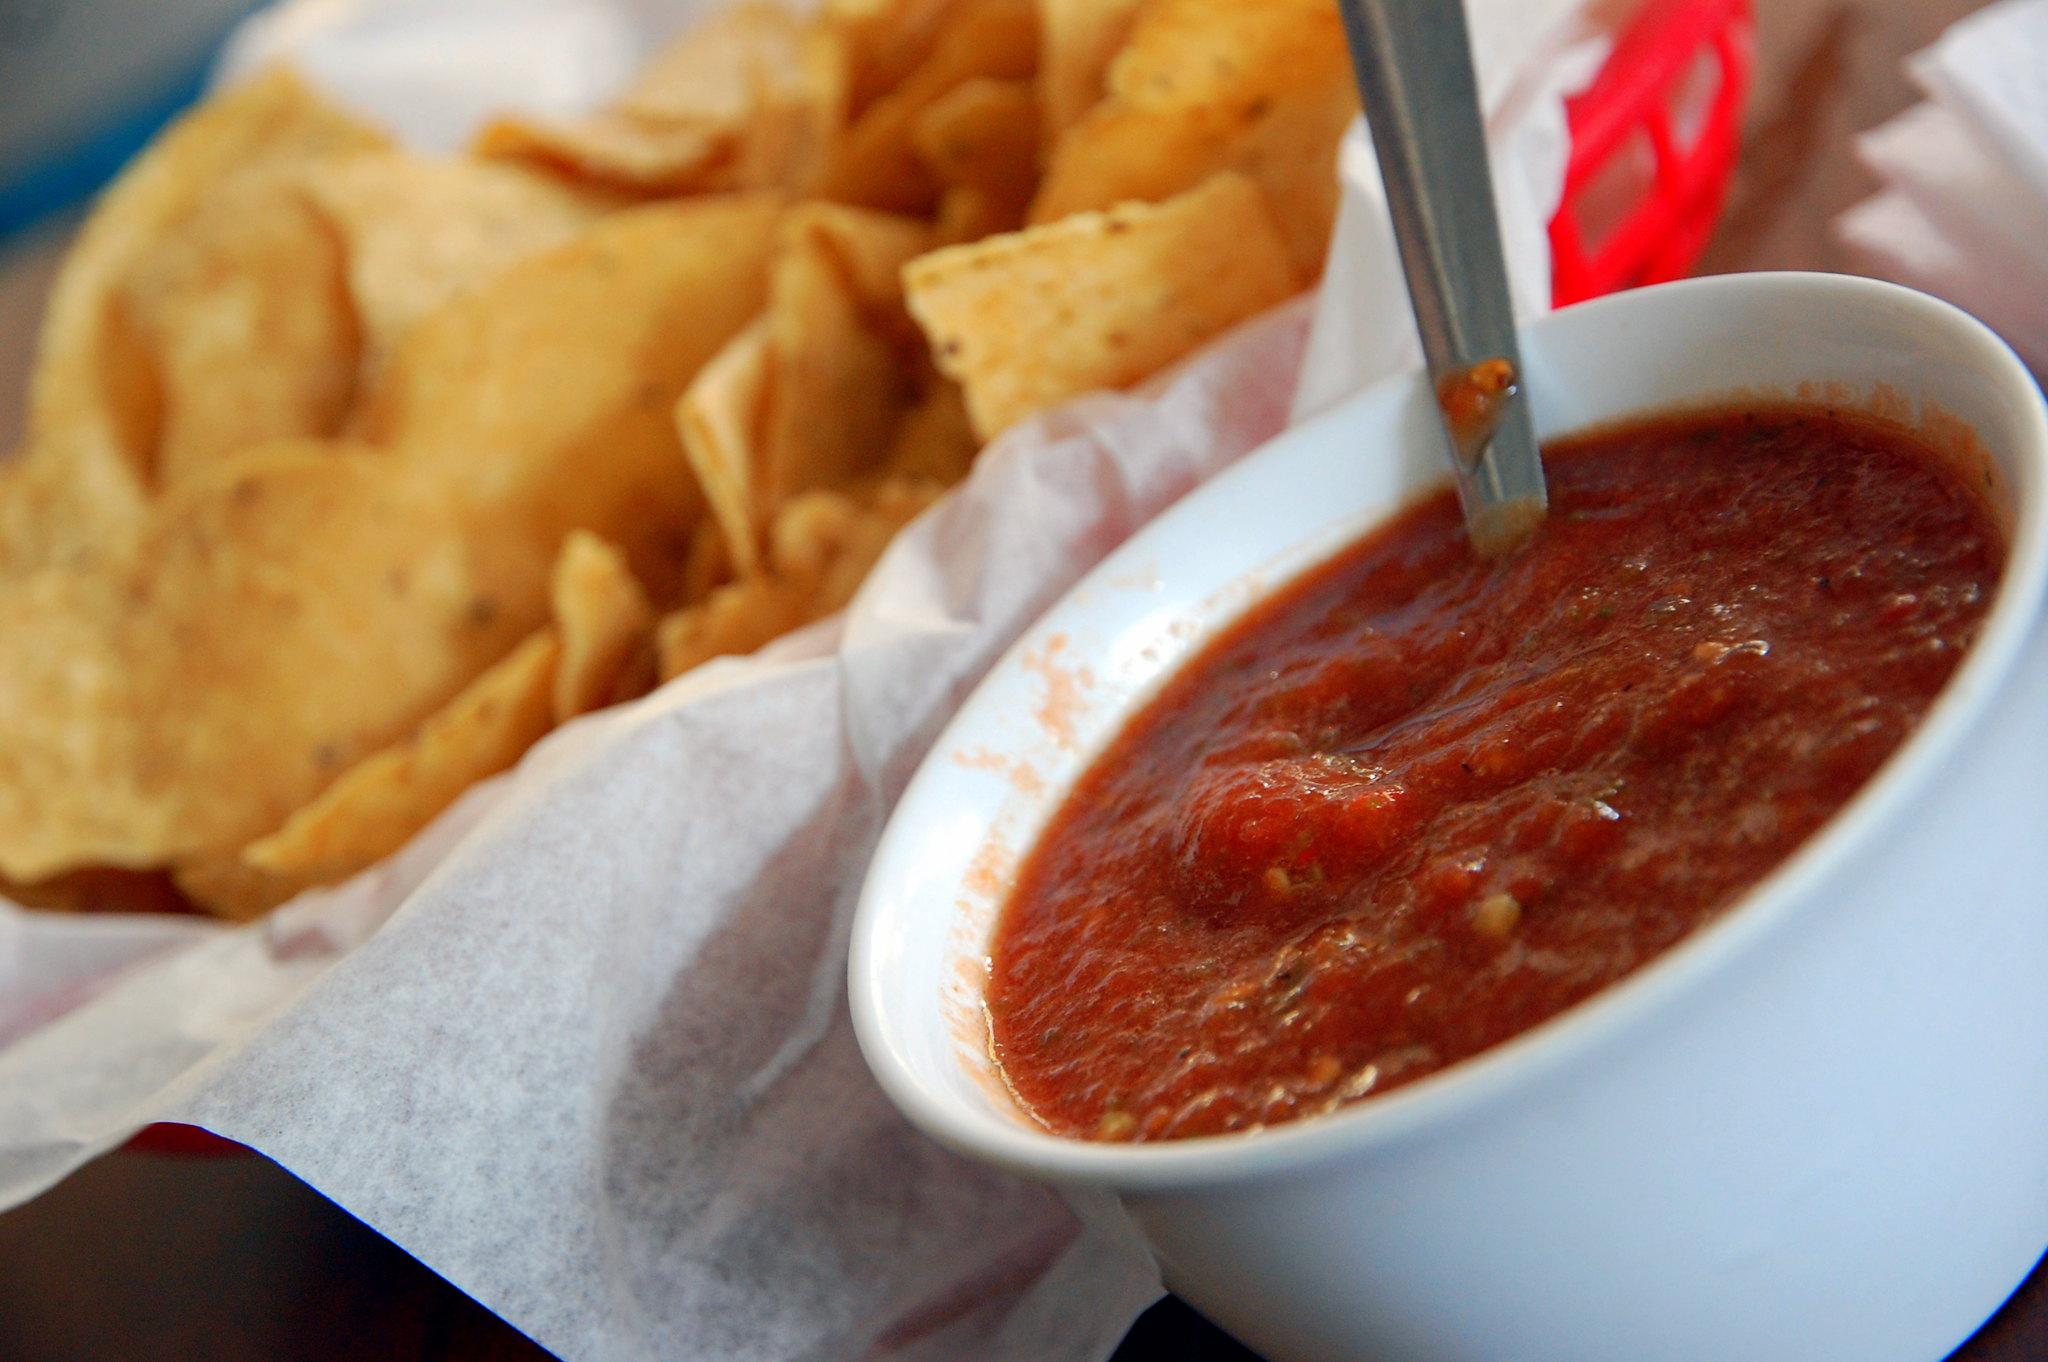 Chips 'n' HOT Salsa